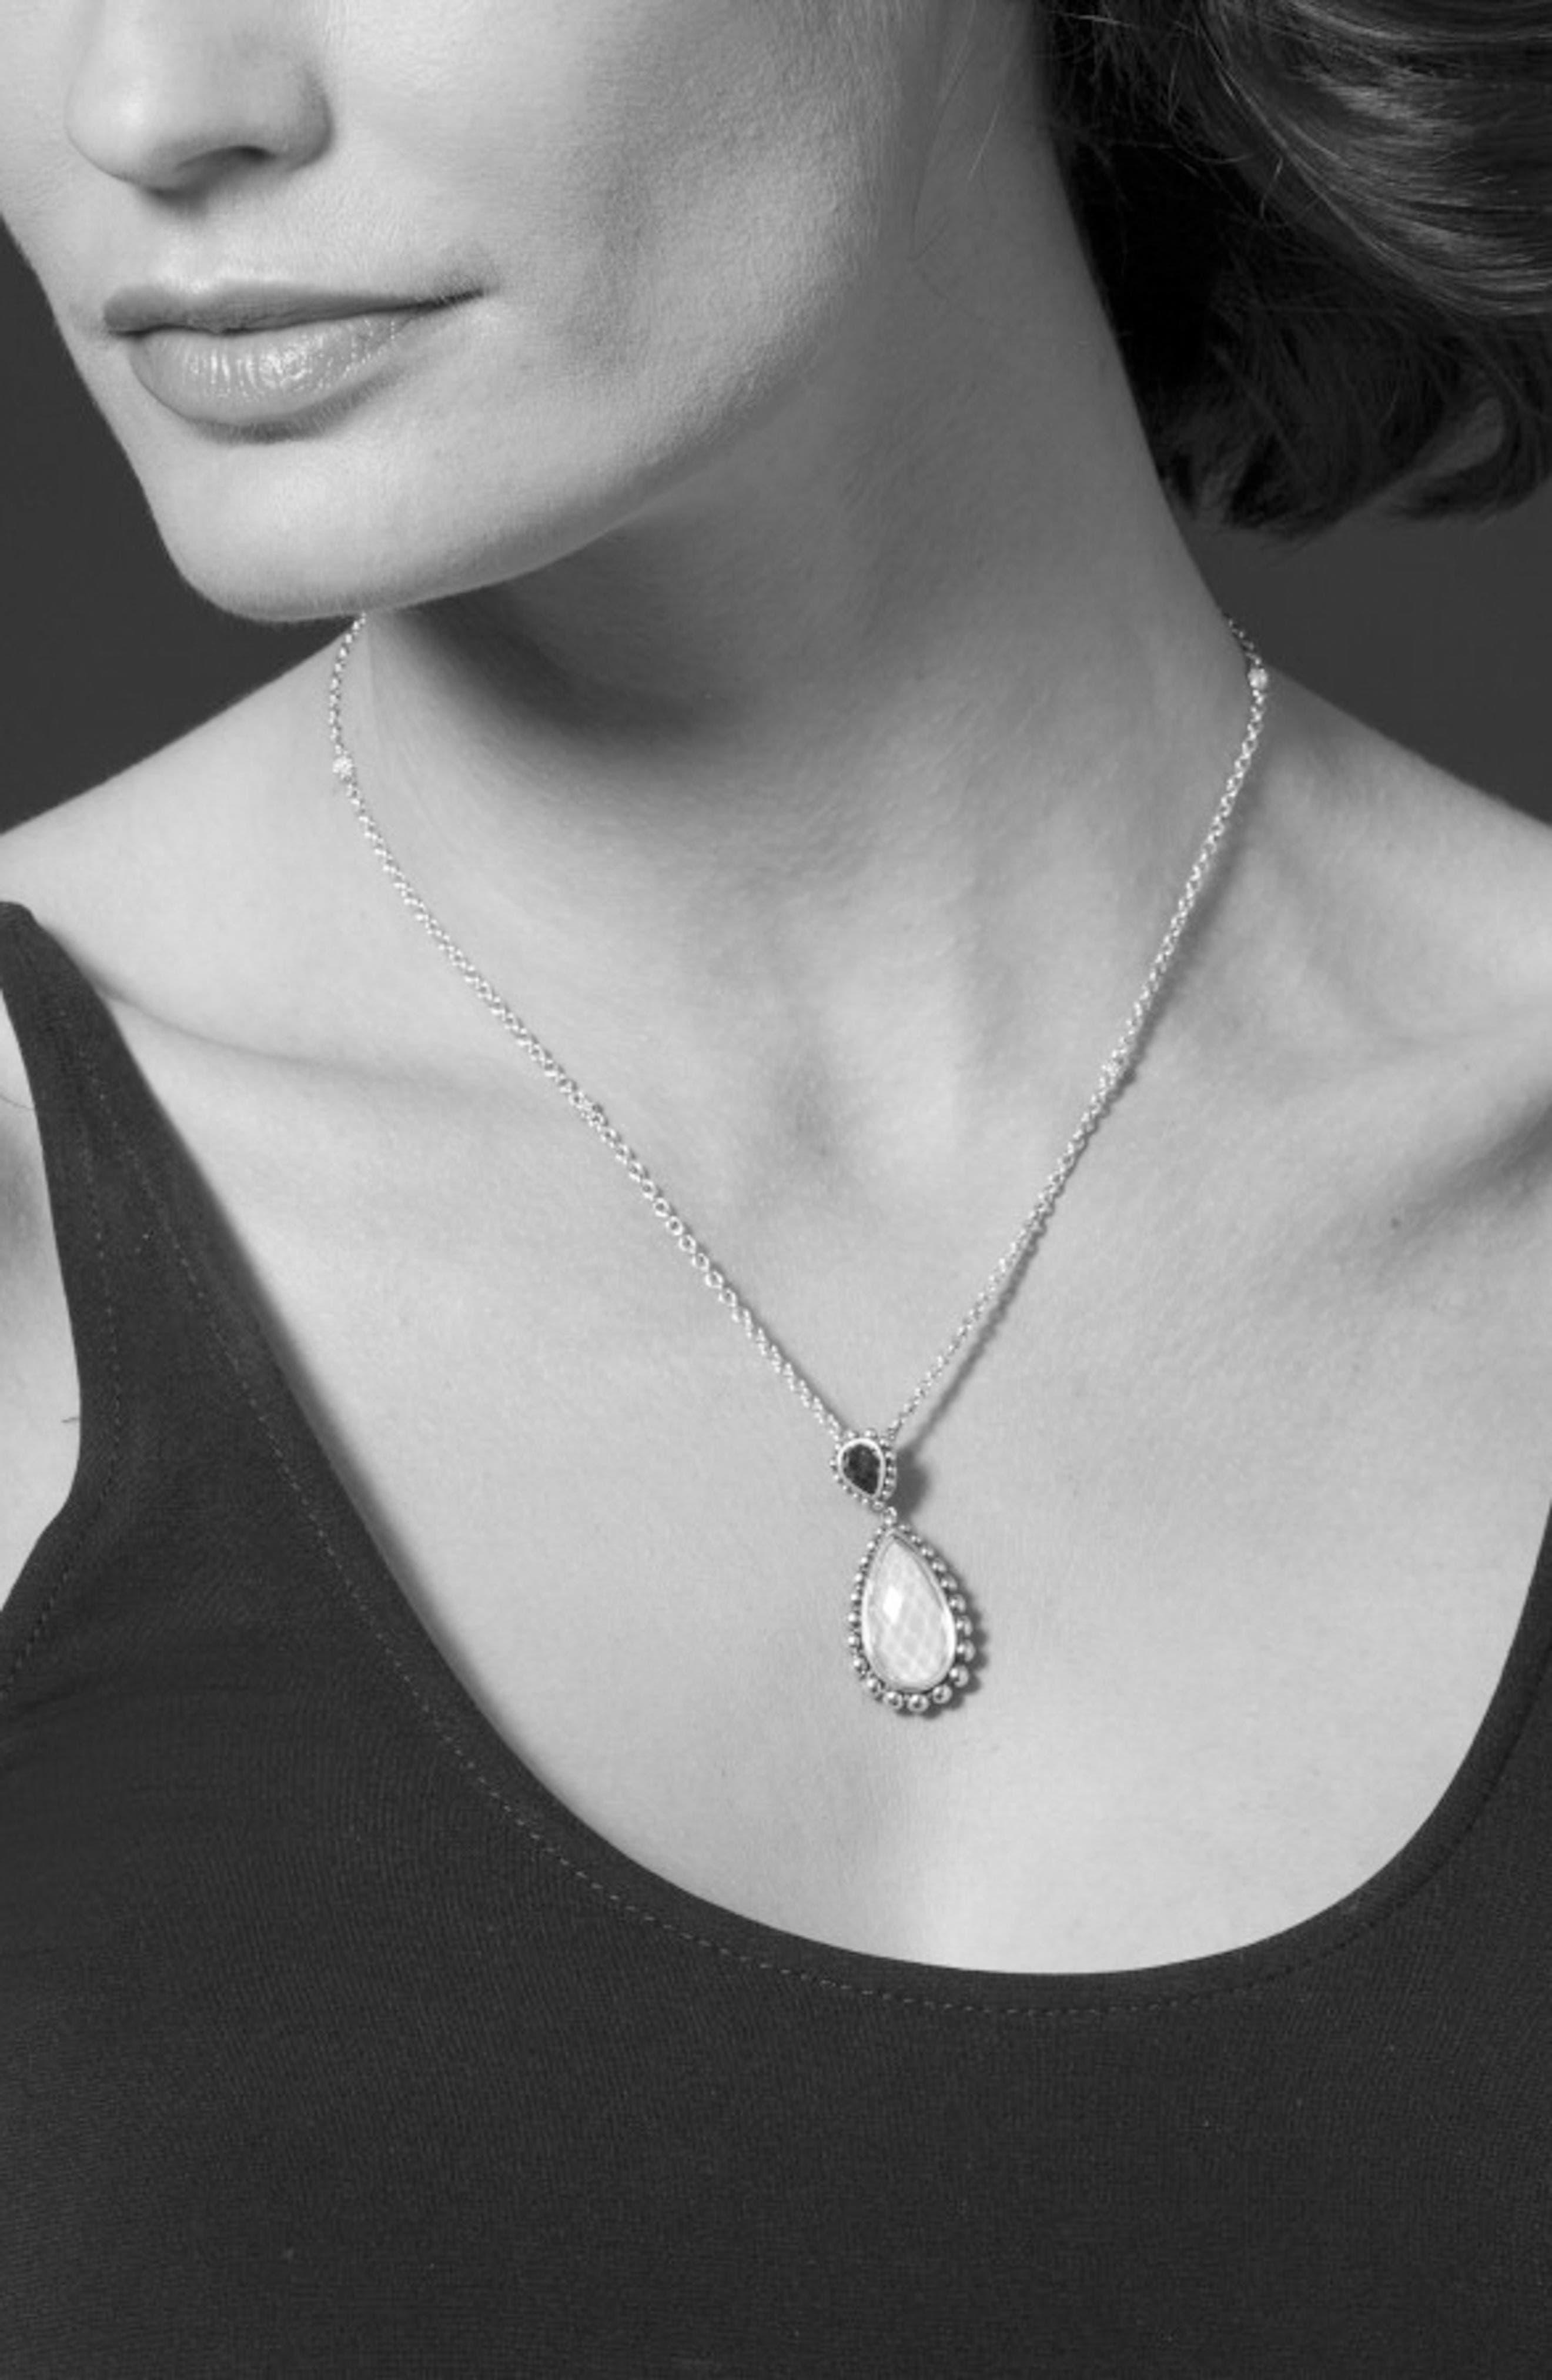 Maya Semiprecious Stone Pendant Necklace,                             Alternate thumbnail 3, color,                             Turquoise